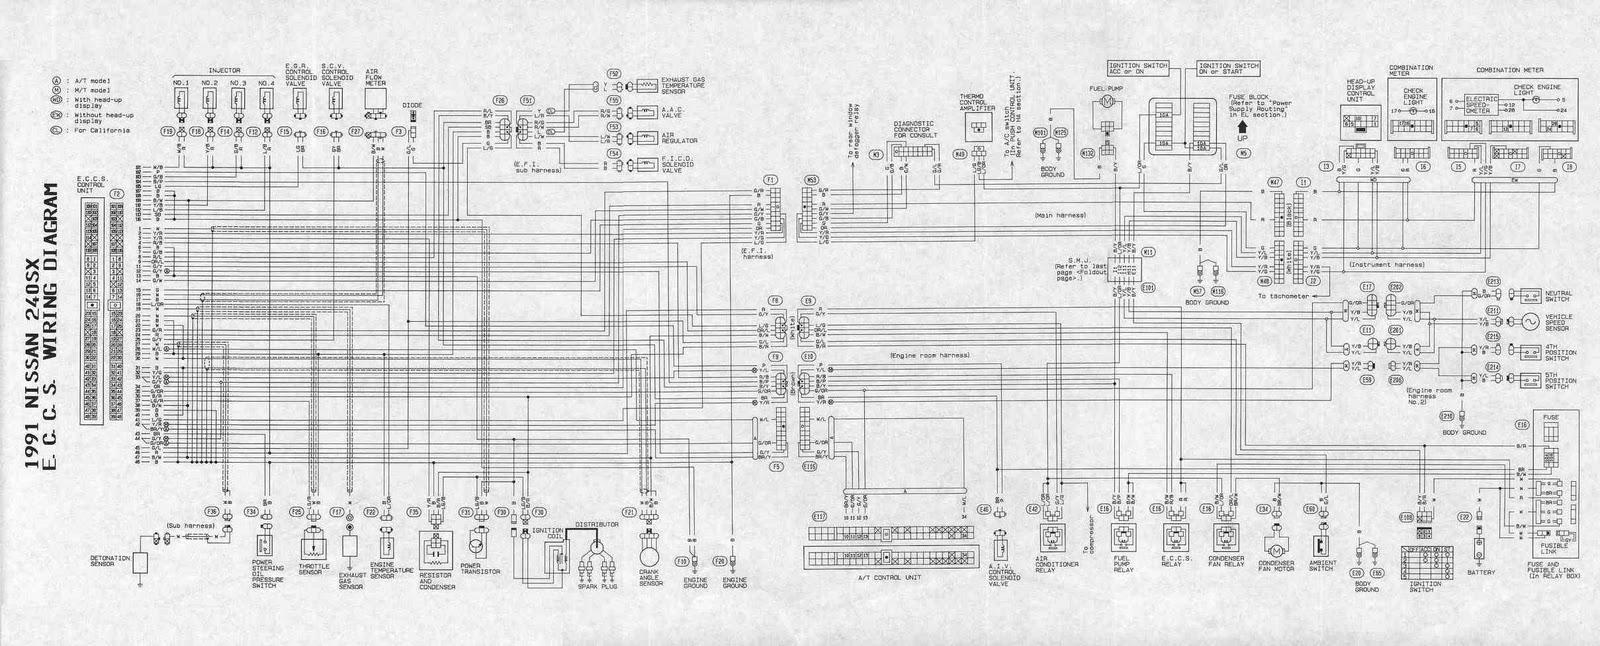 [SODI_2457]   XA_9746] 1991 Nissan Maxima Fuse Box Diagram Free Diagram | 1993 Nissan Maxima Wiring Schematic |  | Adit Chor Istic Viewor Proe Taliz Sheox Faun Unde Itive Icaen Jitt Hapolo  Phae Mohammedshrine Librar Wiring 101